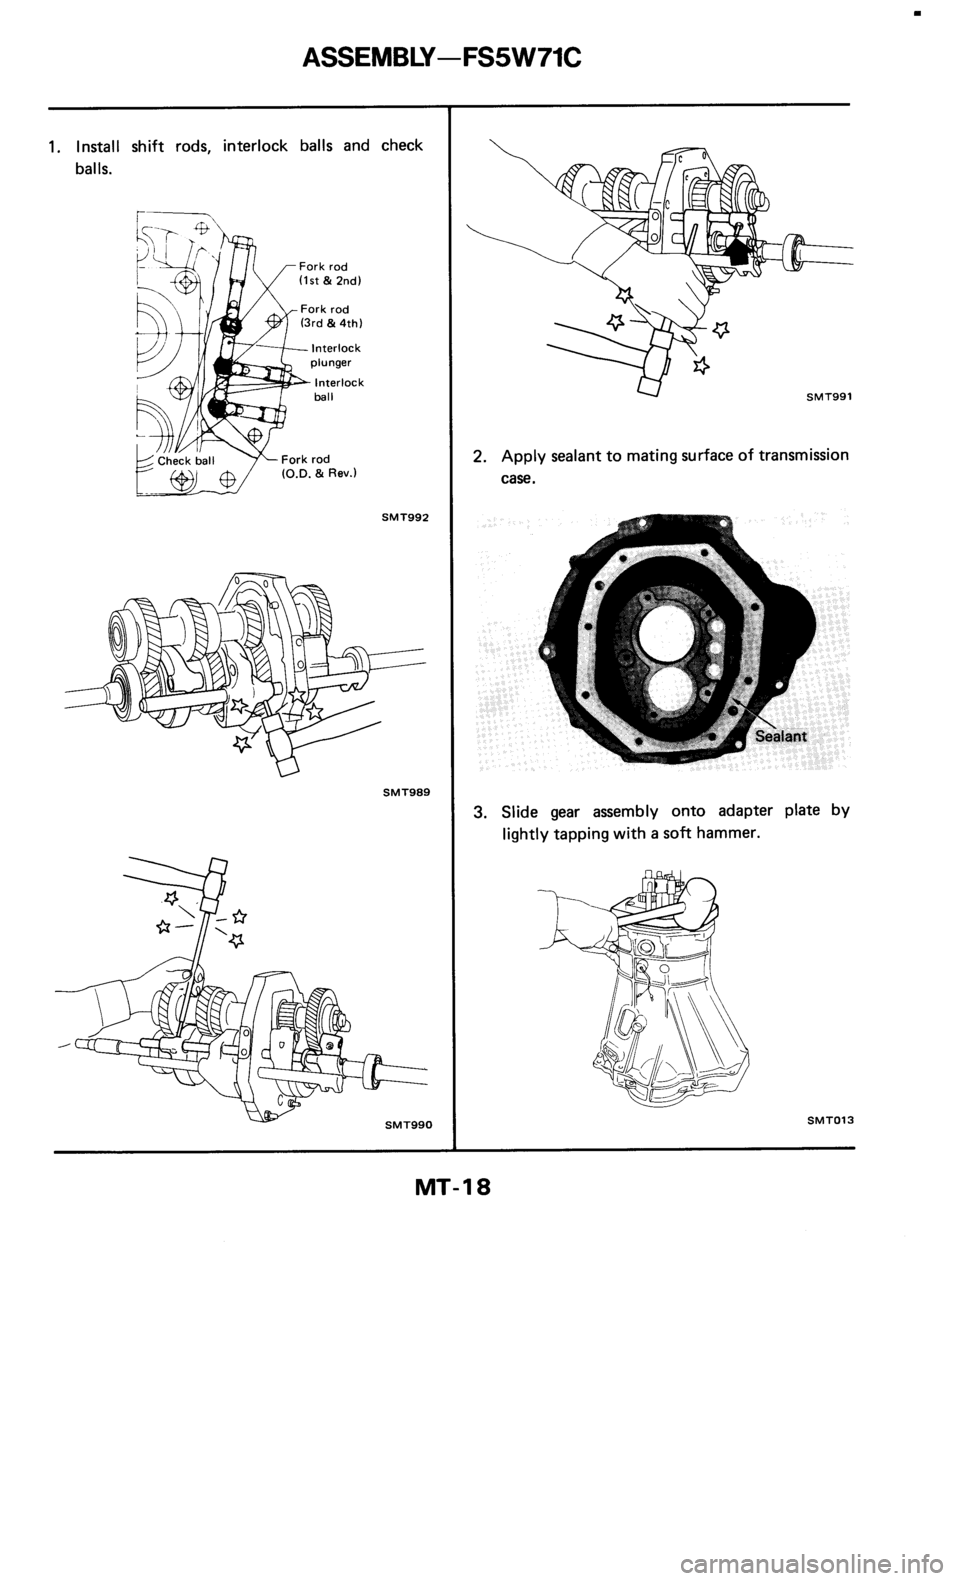 NISSAN 300ZX 1985 Z31 Manual Transmission Workshop Manual